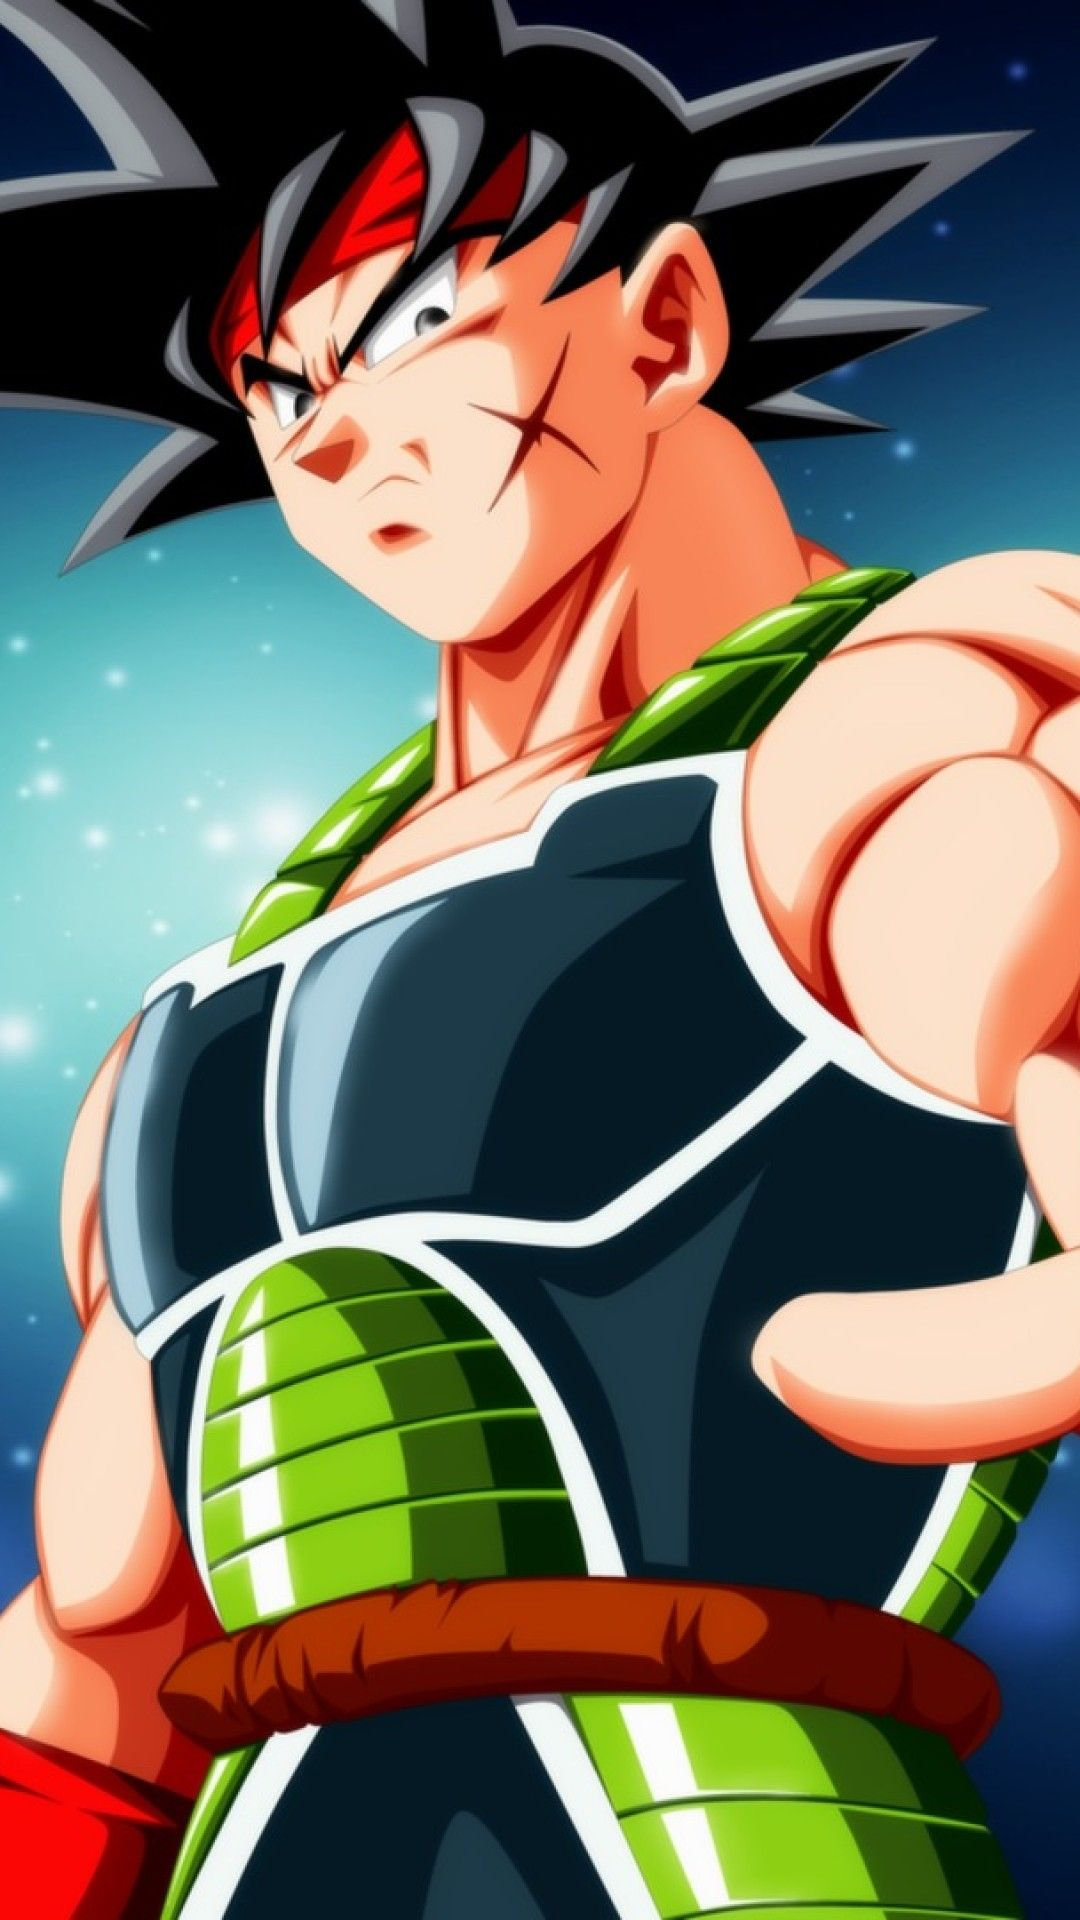 Wallpaper Phone Bardock Full Hd Personajes De Goku Personajes De Dragon Ball Figuras De Goku